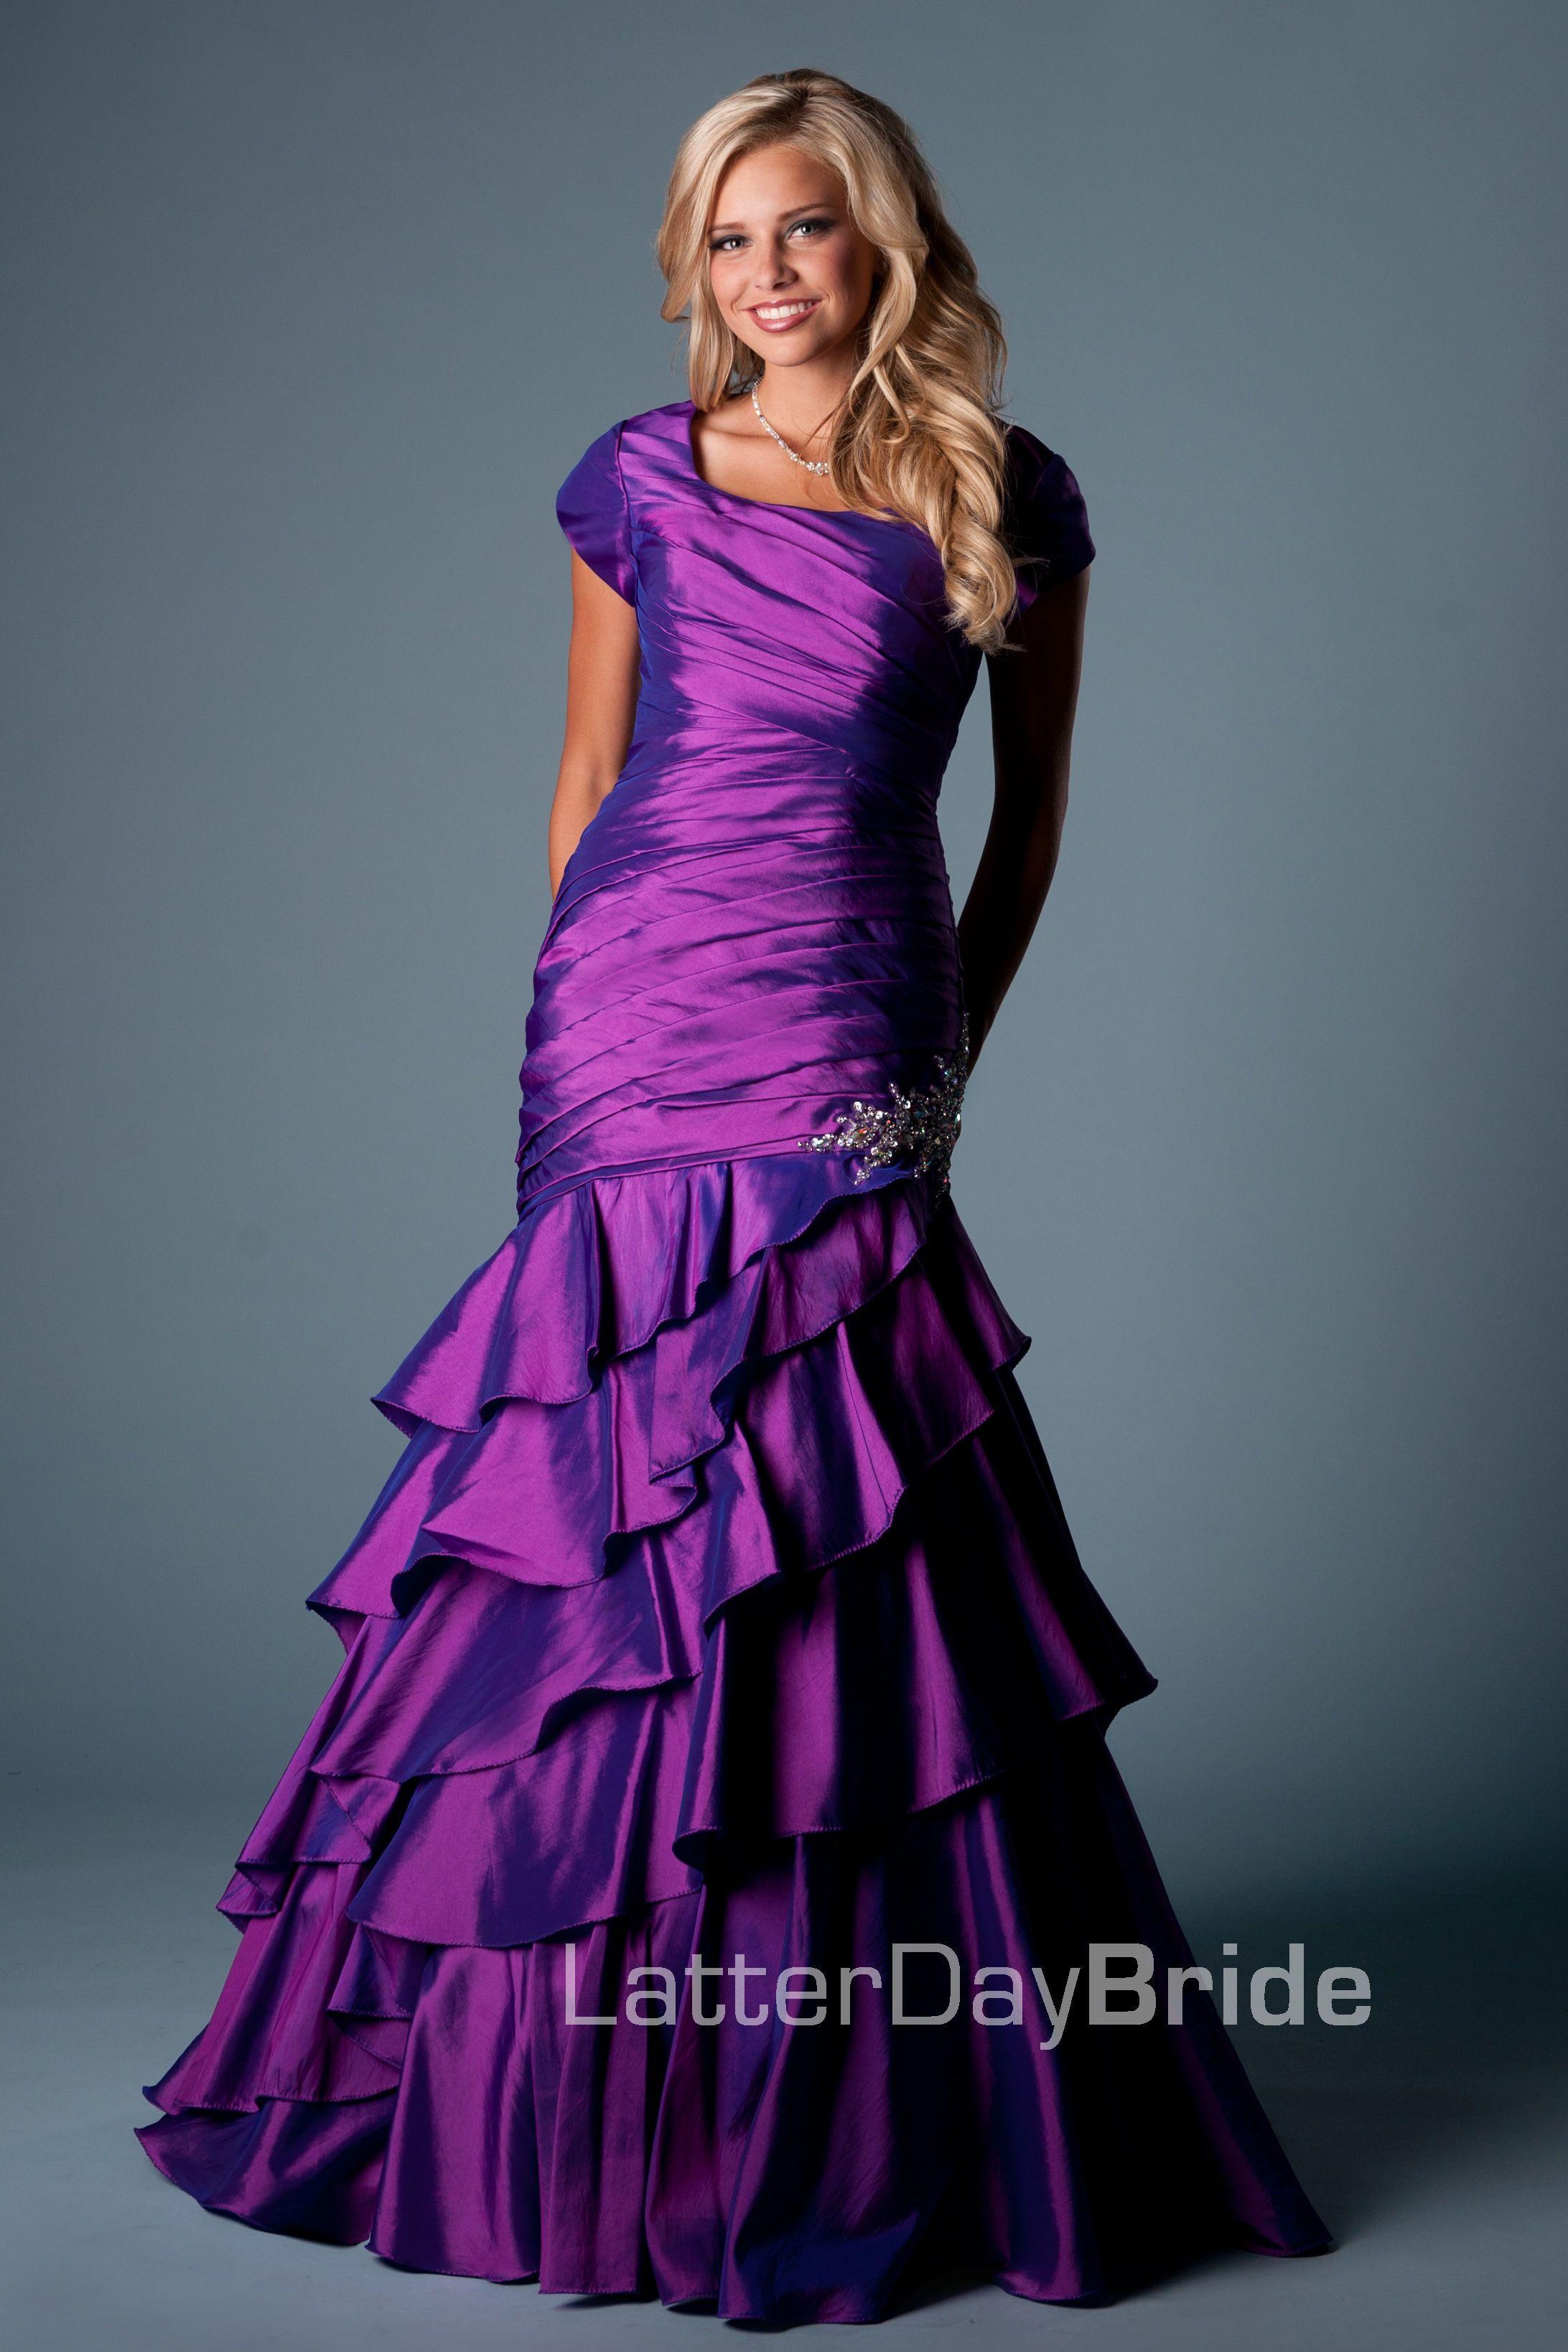 Bridesmaid Prom Sandie Latterdaybride Prom Modest Mormon Lds Prom Dress Prom Dresses Modest Fancy Dresses Long Pretty Prom Dresses [ 3276 x 2184 Pixel ]